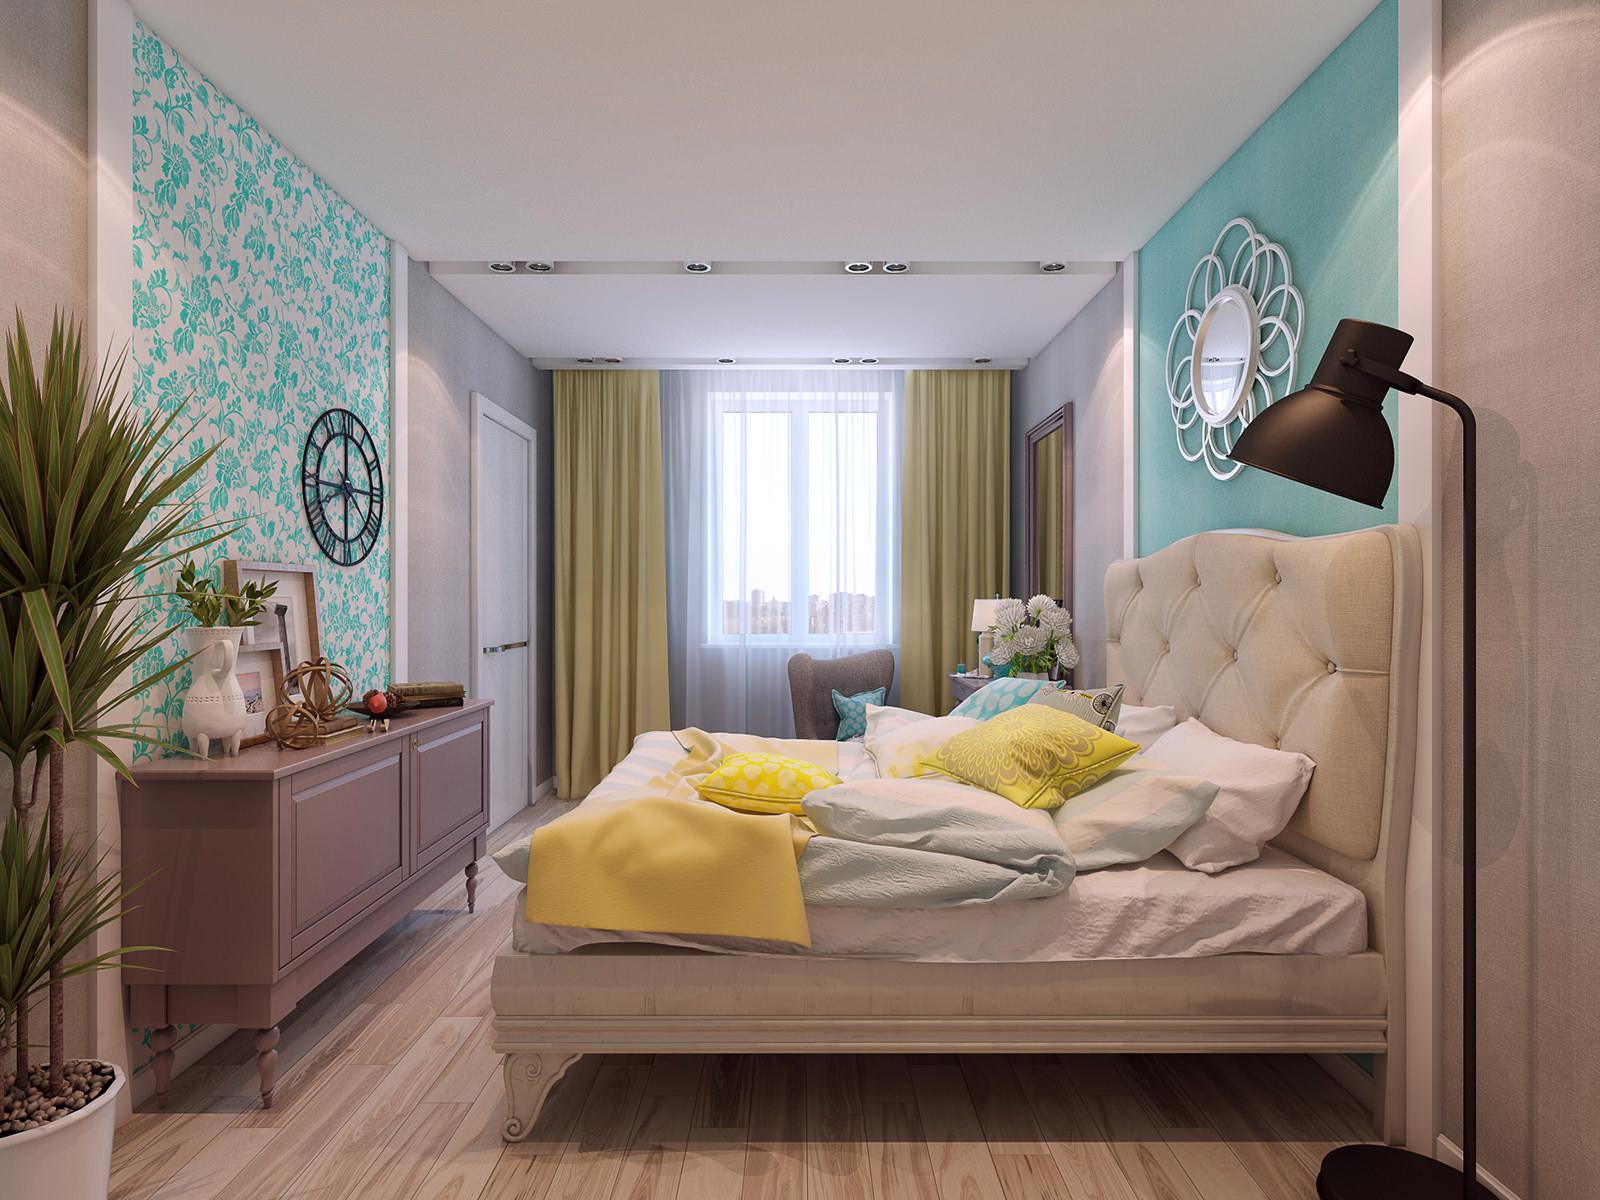 dizajn-3-kh-komnatnoj-kvartiry-80-kv-metrov18